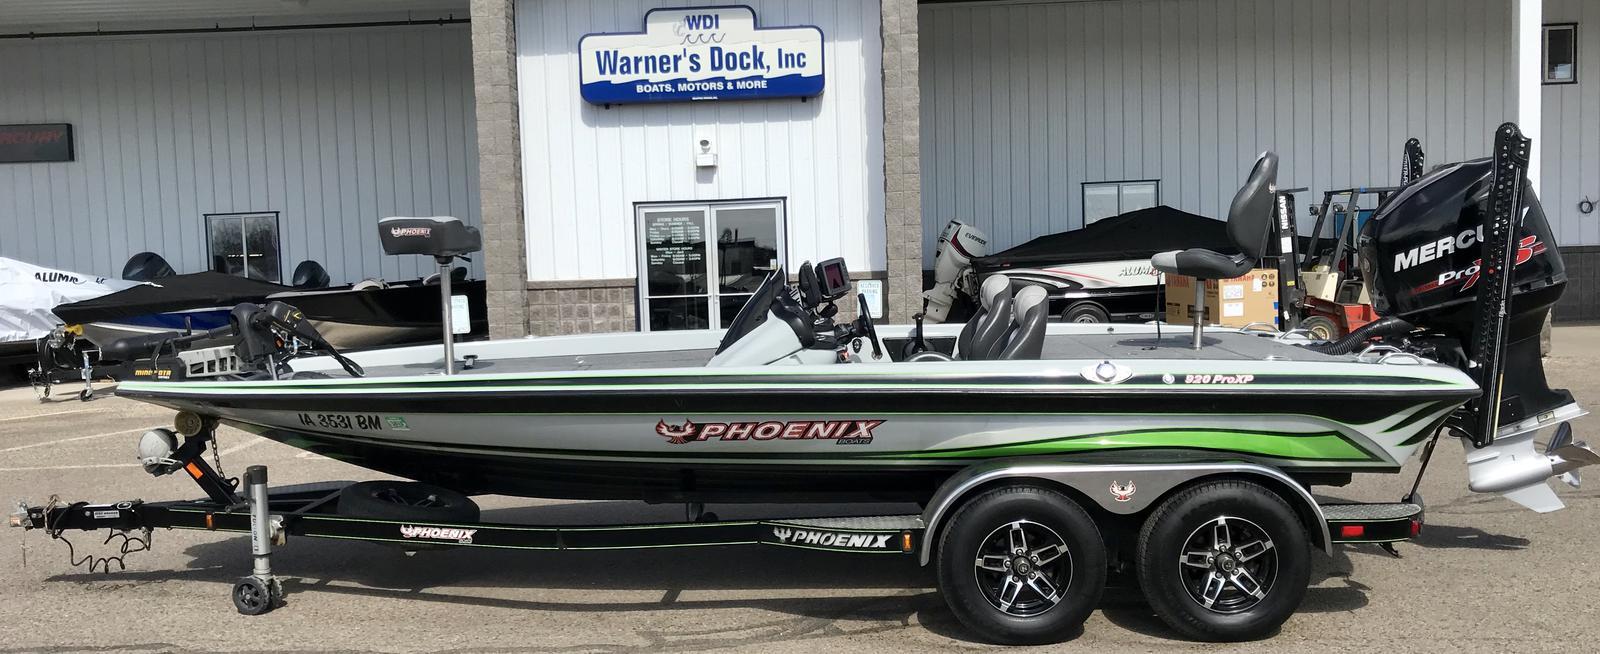 Phoenix Boats For Sale >> 2014 Phoenix Boats 920 Pro Xp